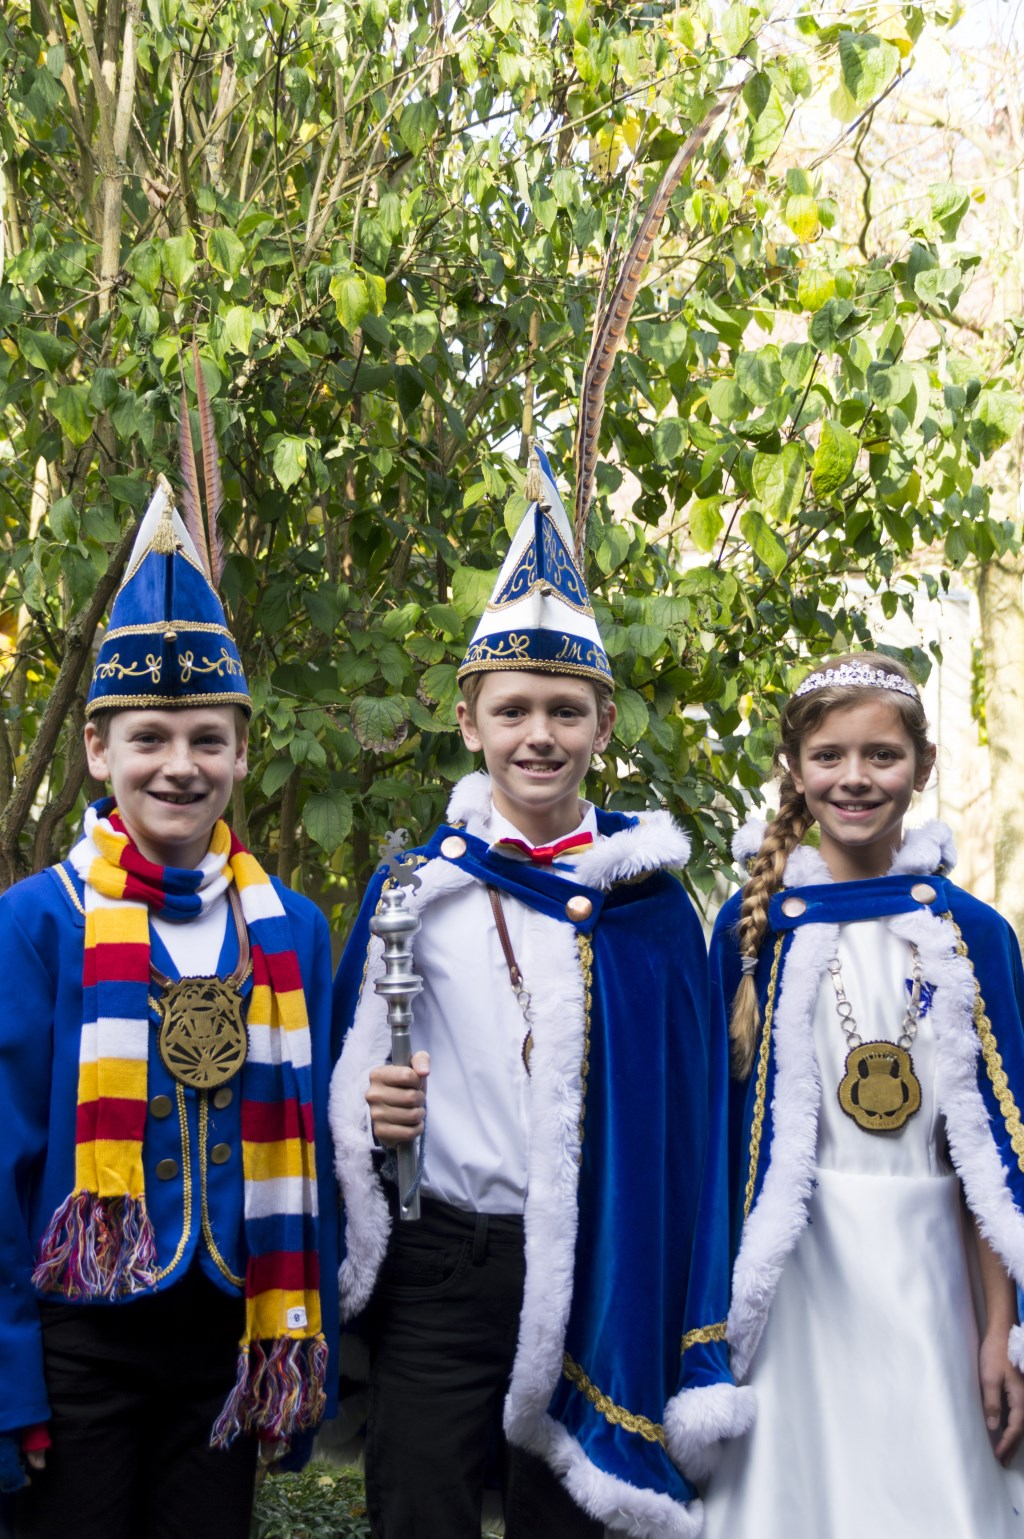 Jeugdprins Karel d'n Uurste en Jeugdprinses Mijntje regeren over Bokkendonk,links op de foto adjudant Finn van Uden Foto: Jeugdprinsenclub Bokkendonk © MooiGestel